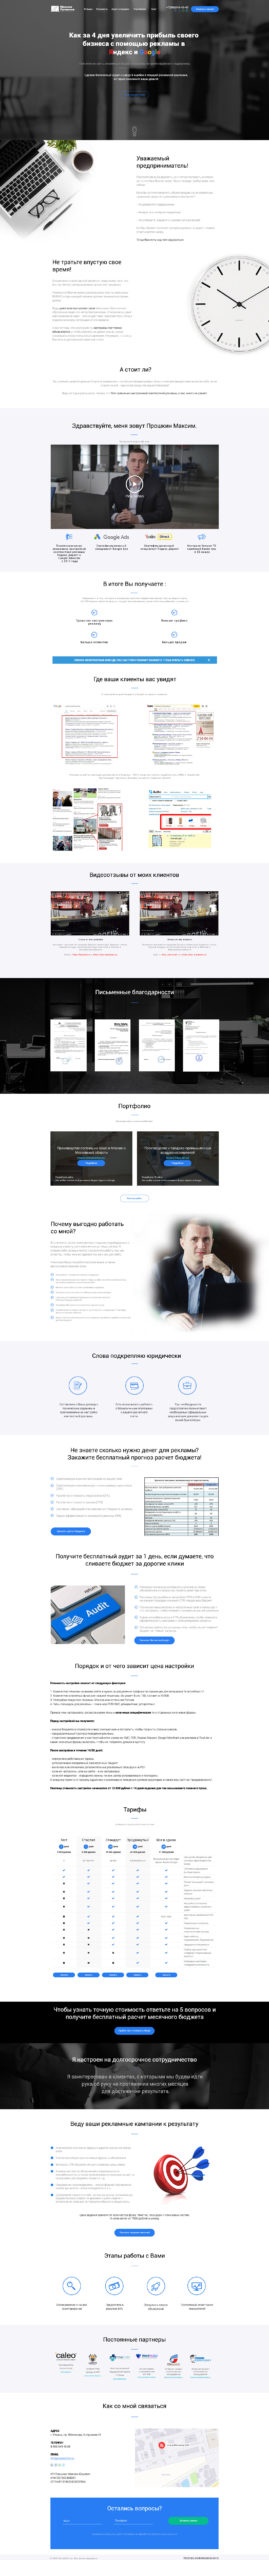 https://28-digital.ru/project/maksim-proshkin/